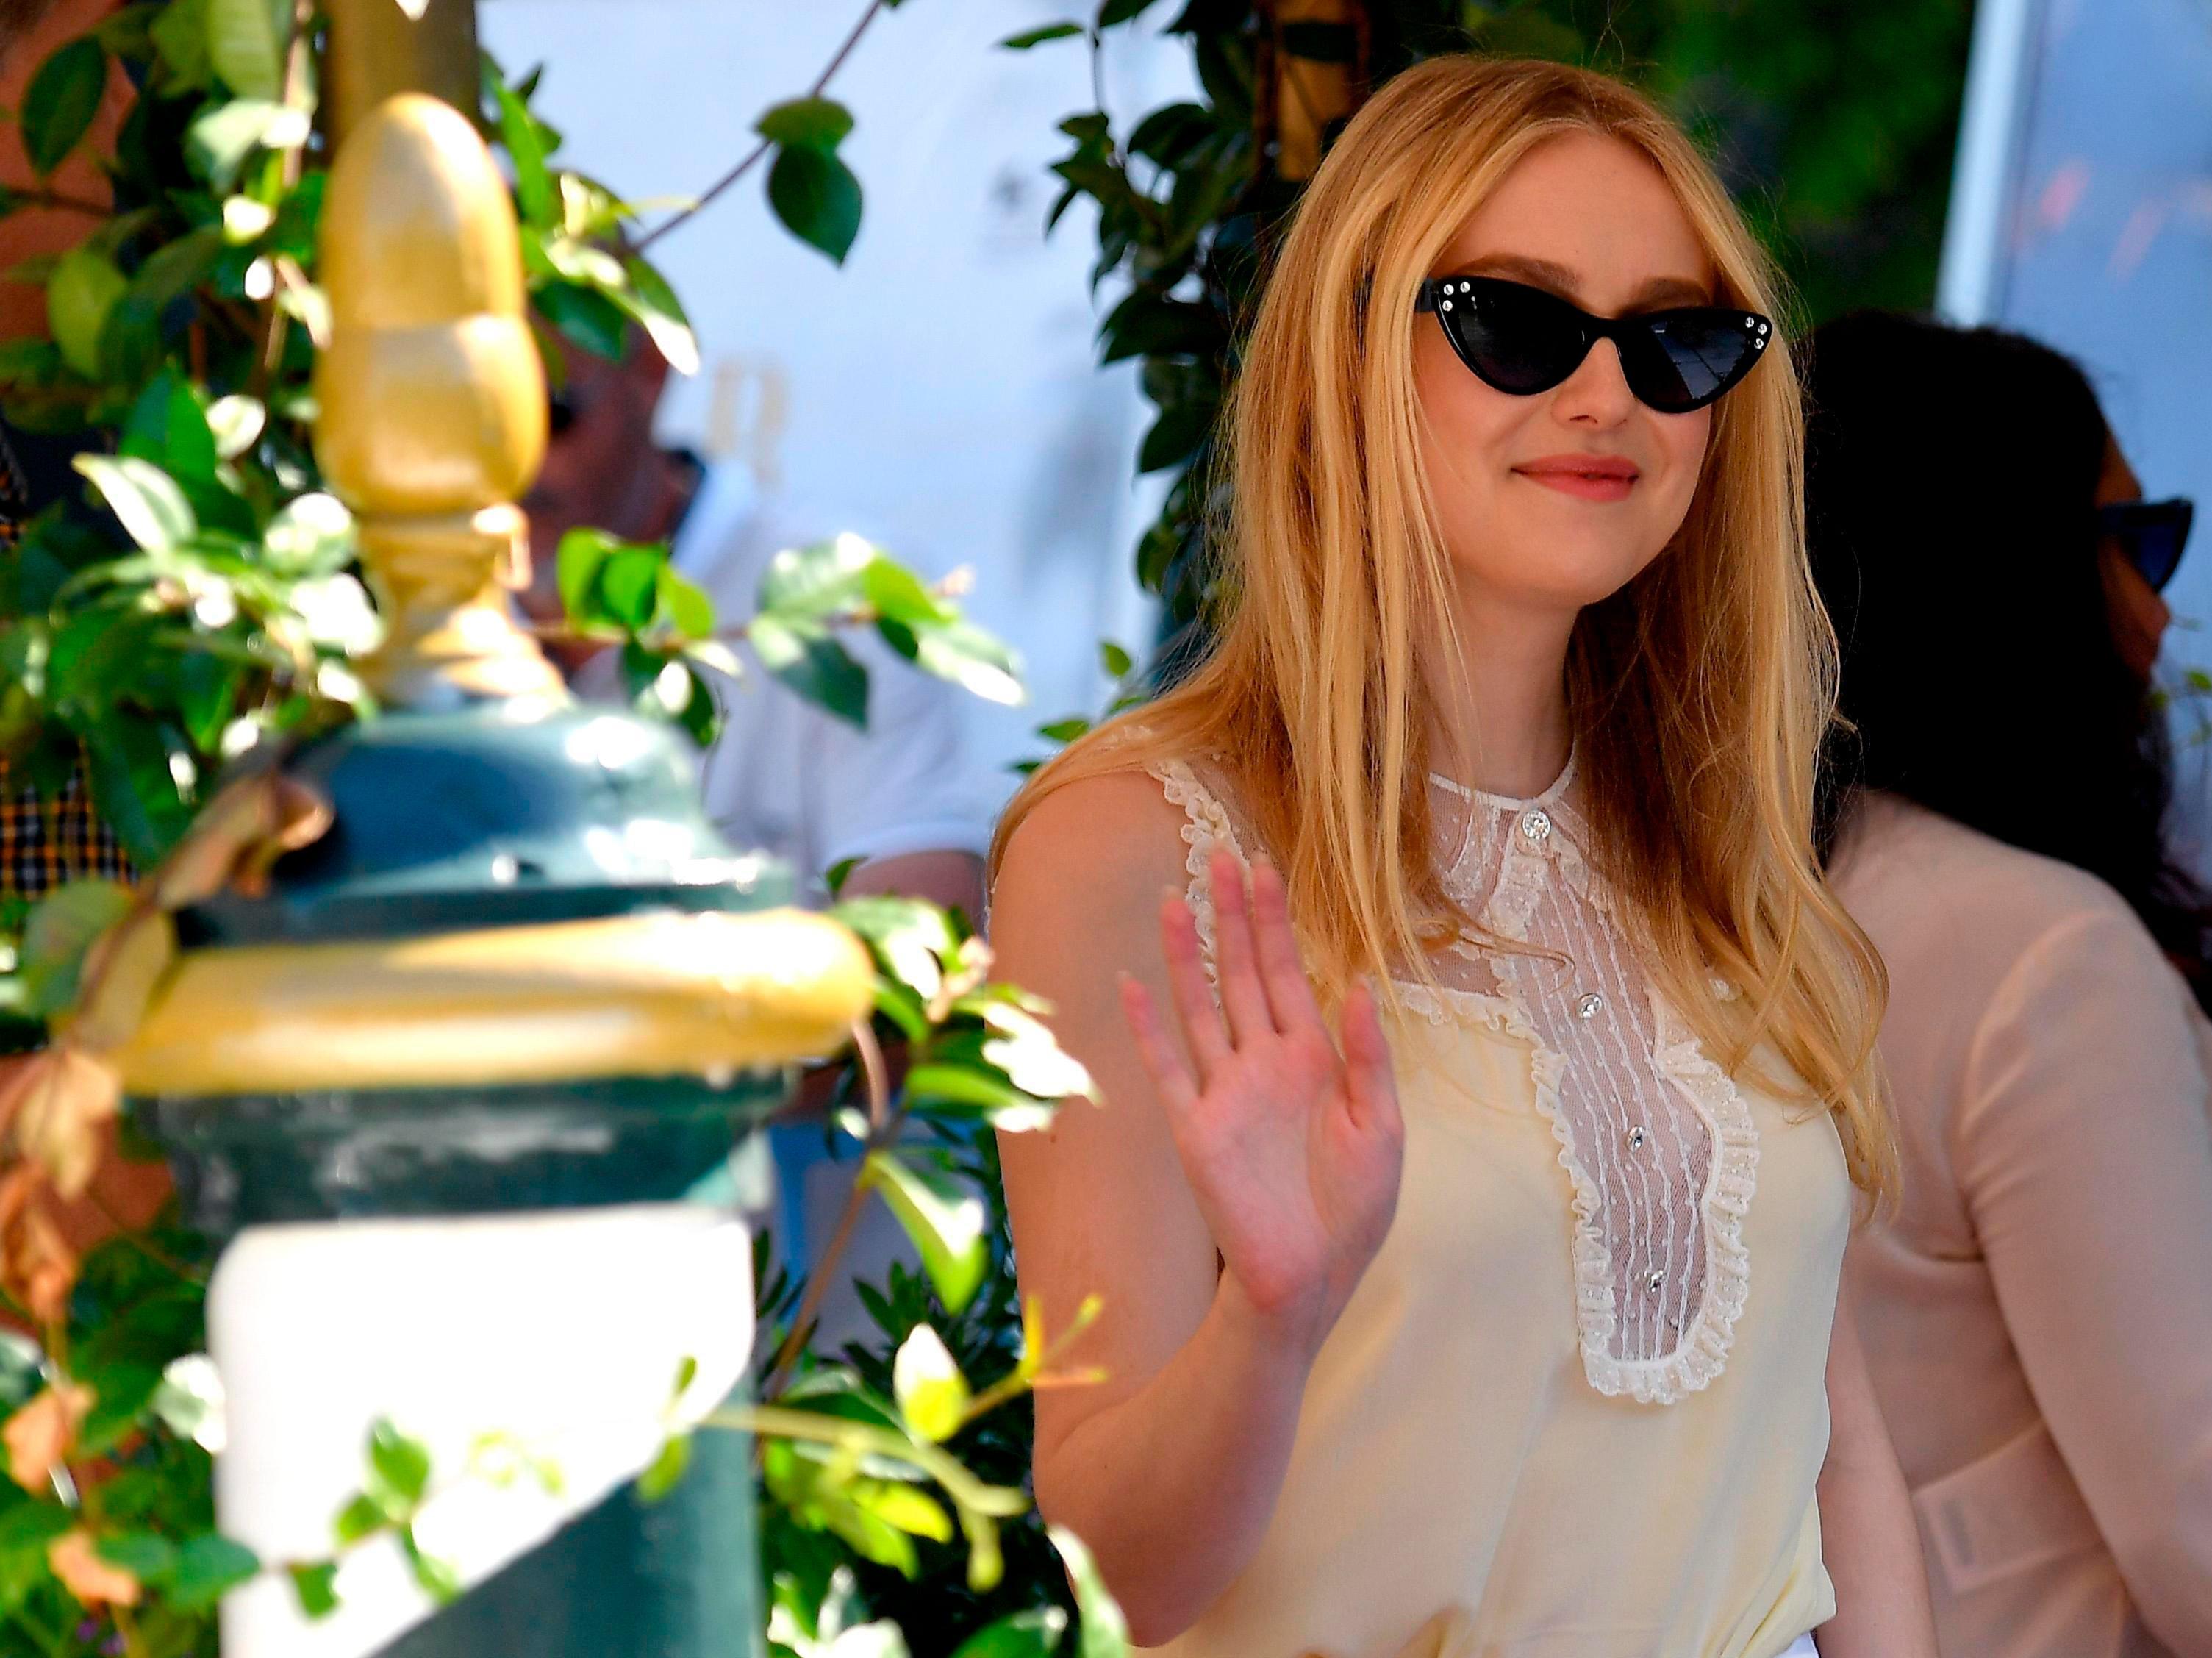 Actress Dakota Fanning arrives at the Lido Beach for the 75th annual Venice International Film Festival, in Venice, Italy, Monday, Sept. 3, 2018. (Ettore Ferrari/ANSA via AP) ORG XMIT: VEN808